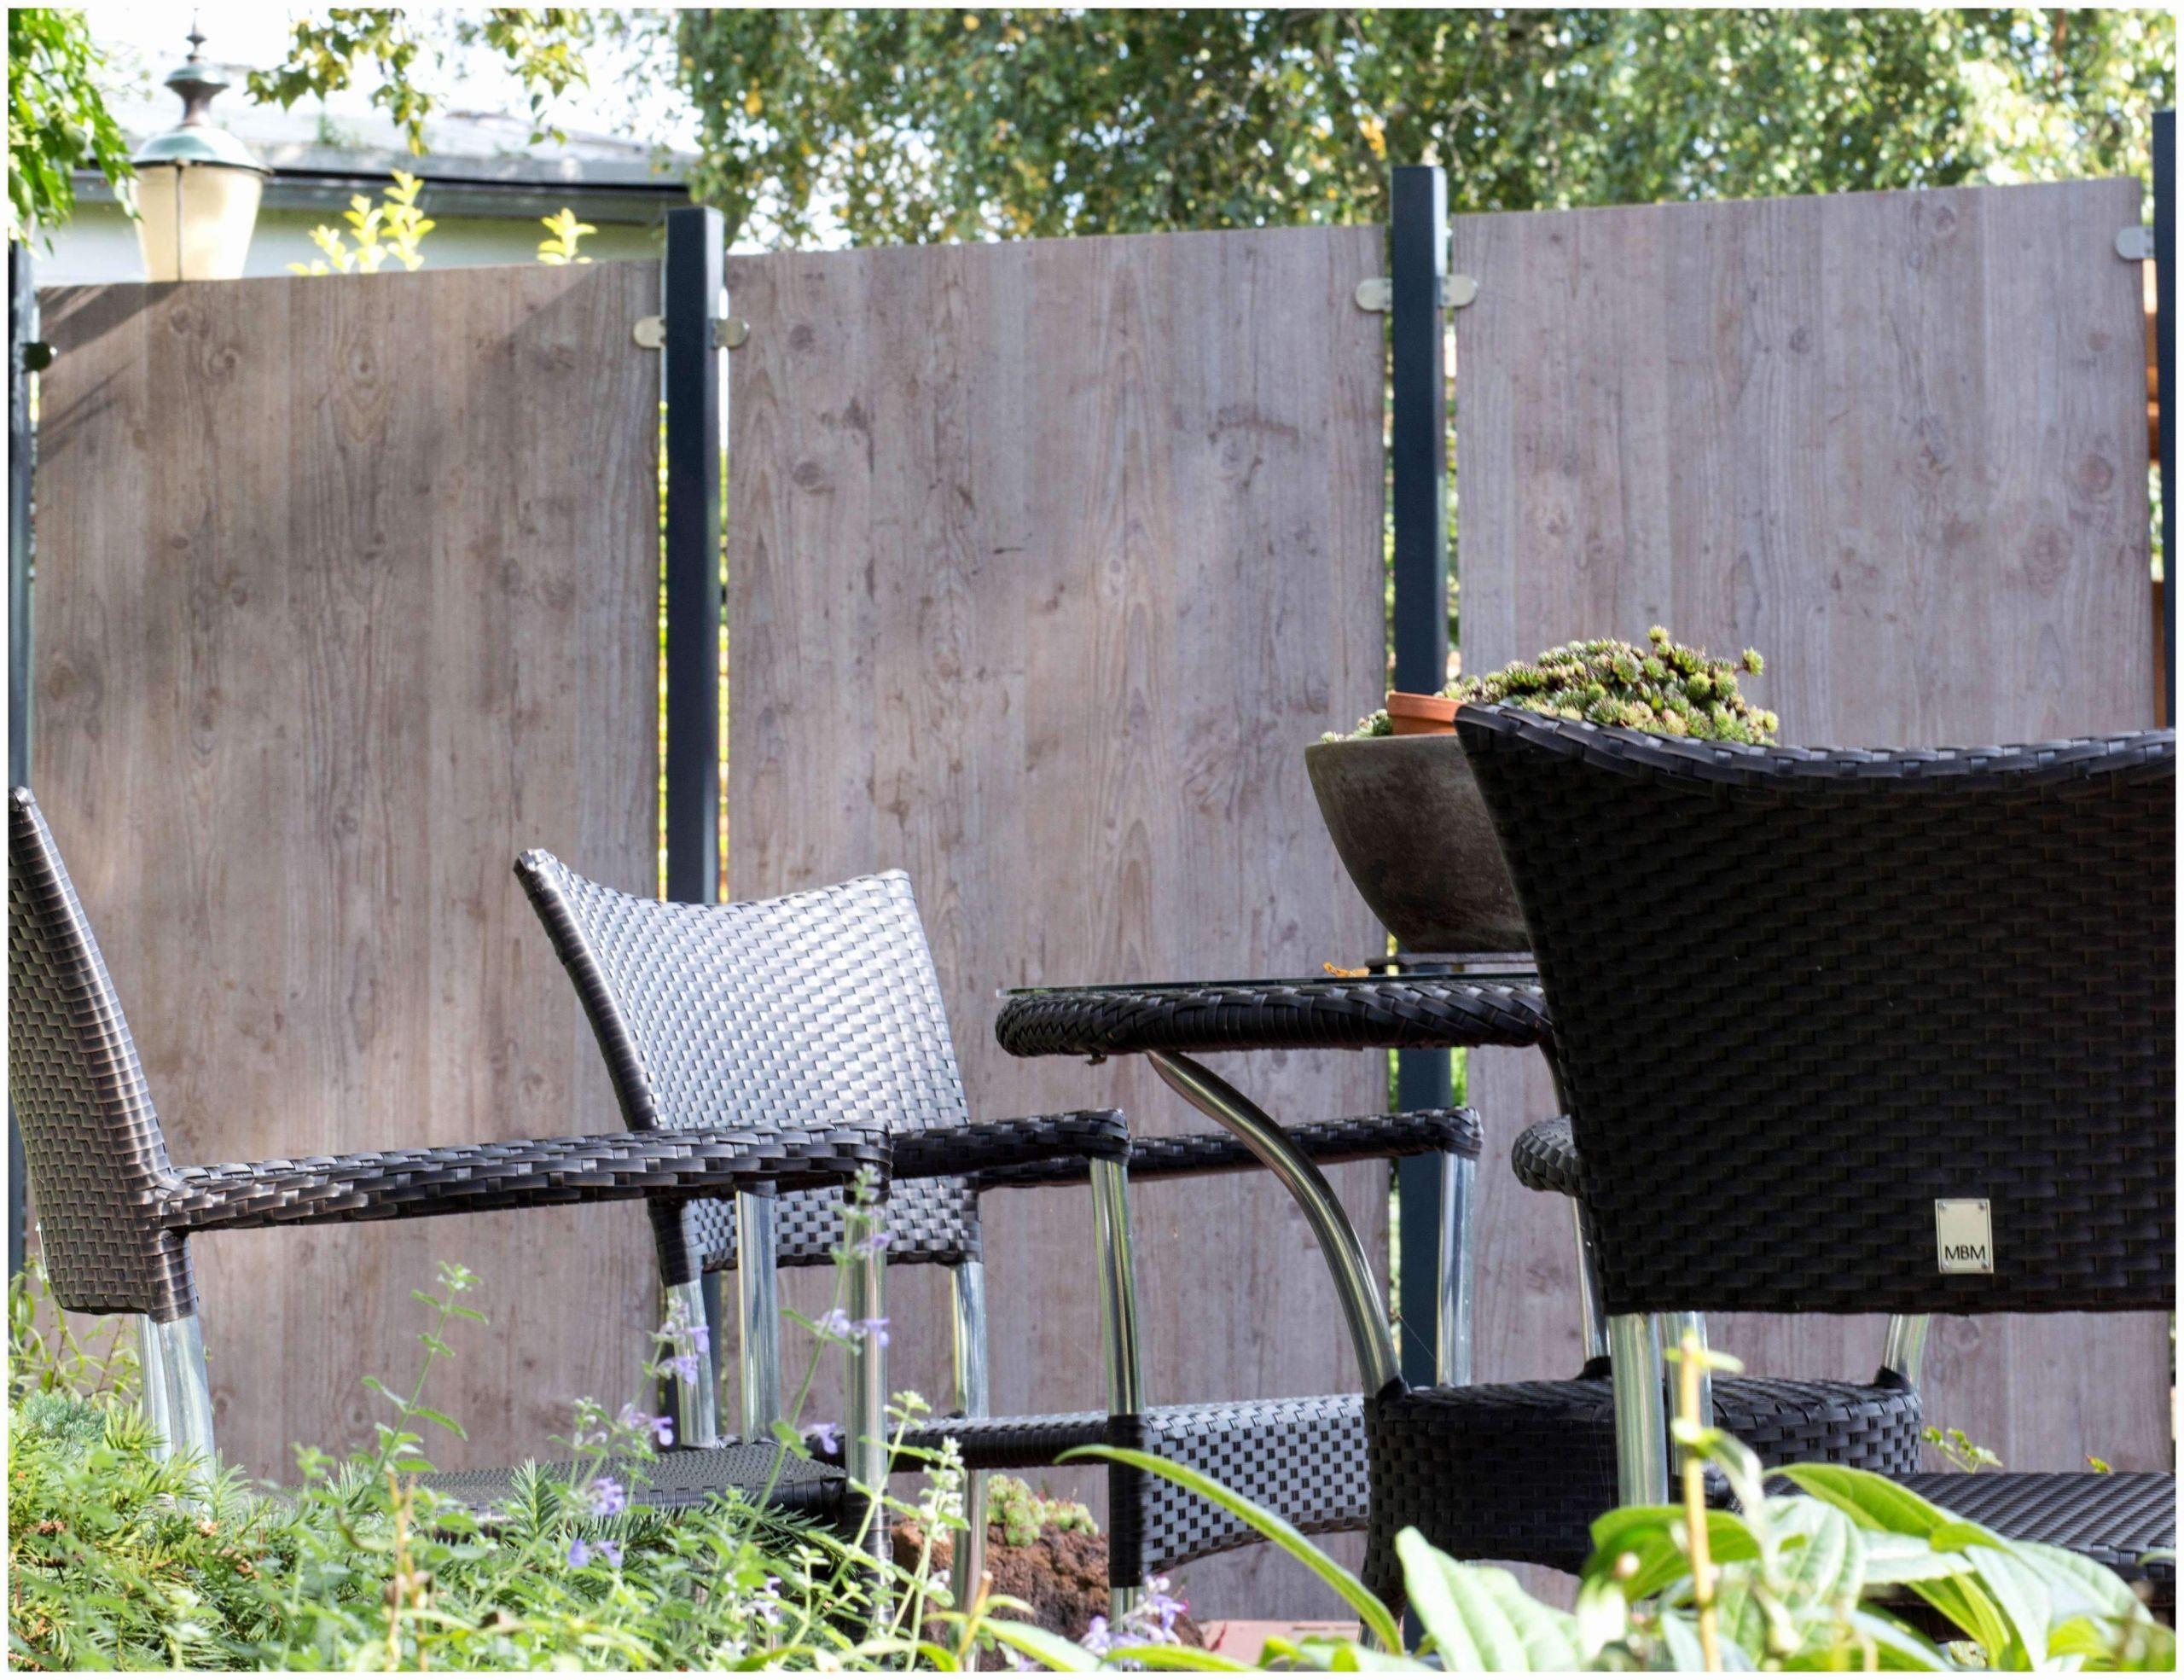 garten terrasse ideen schon 71 luxus garten sichtschutz ideen of garten terrasse ideen scaled